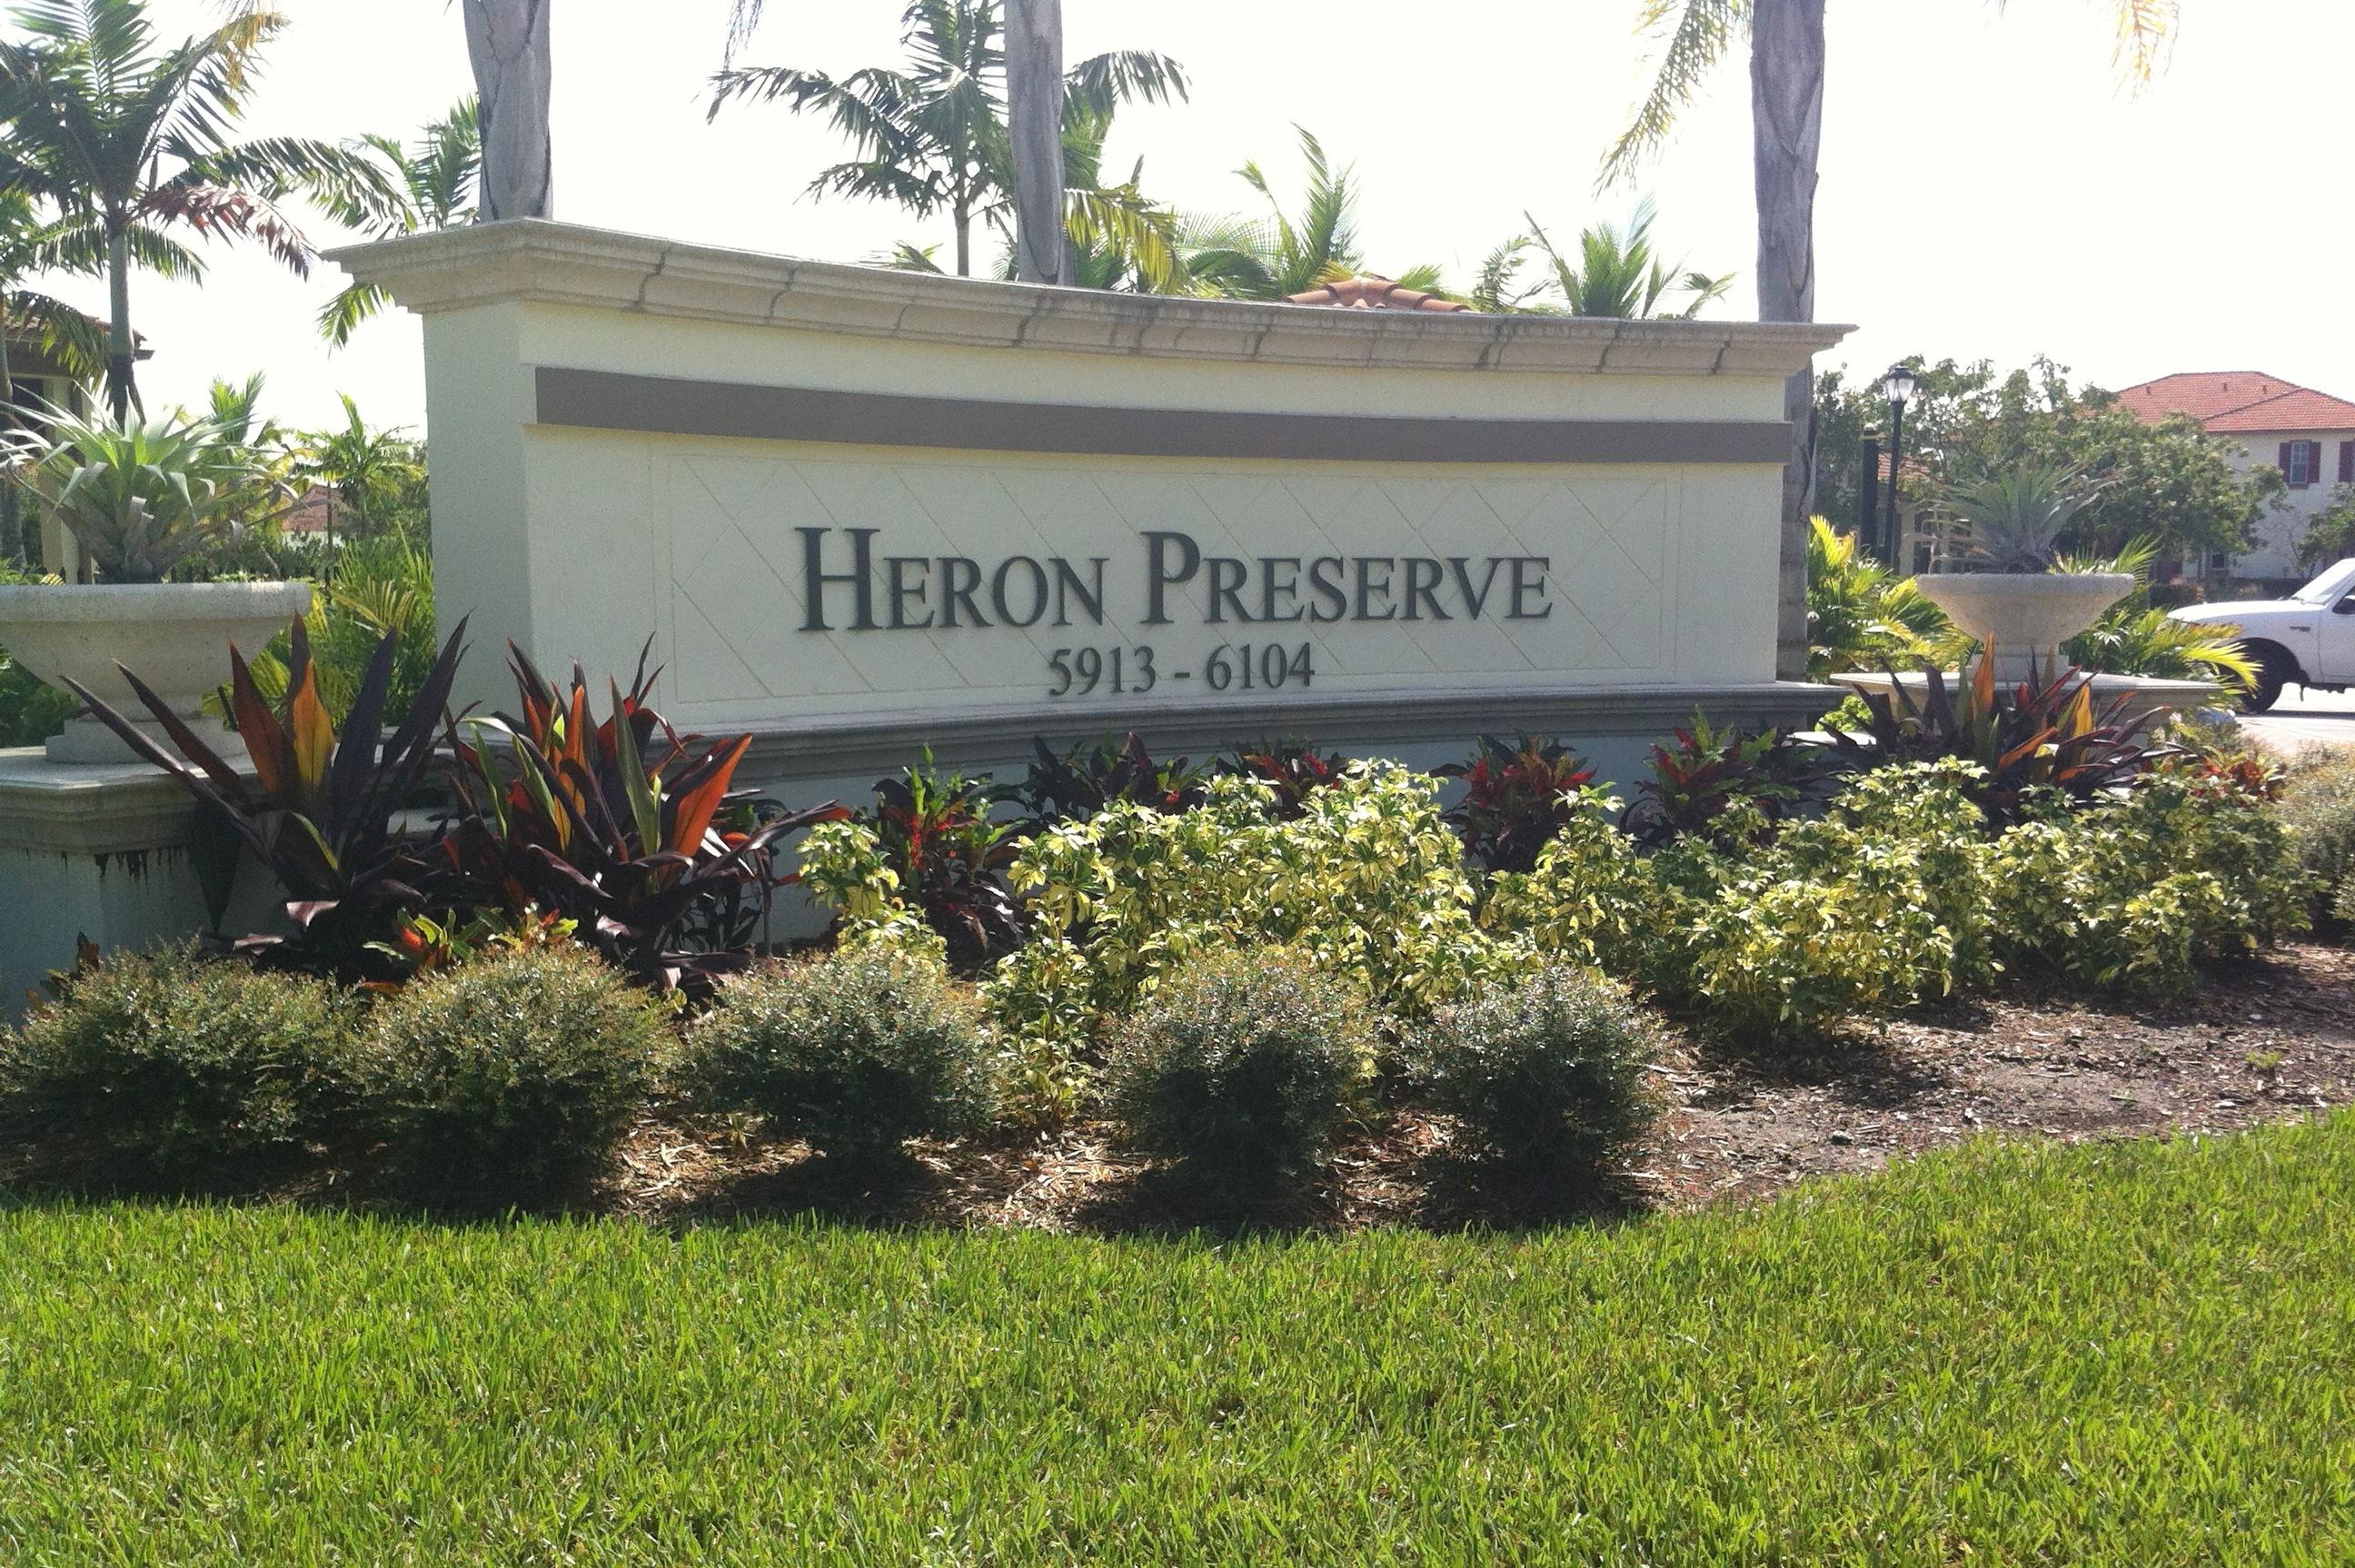 Heron Preserve